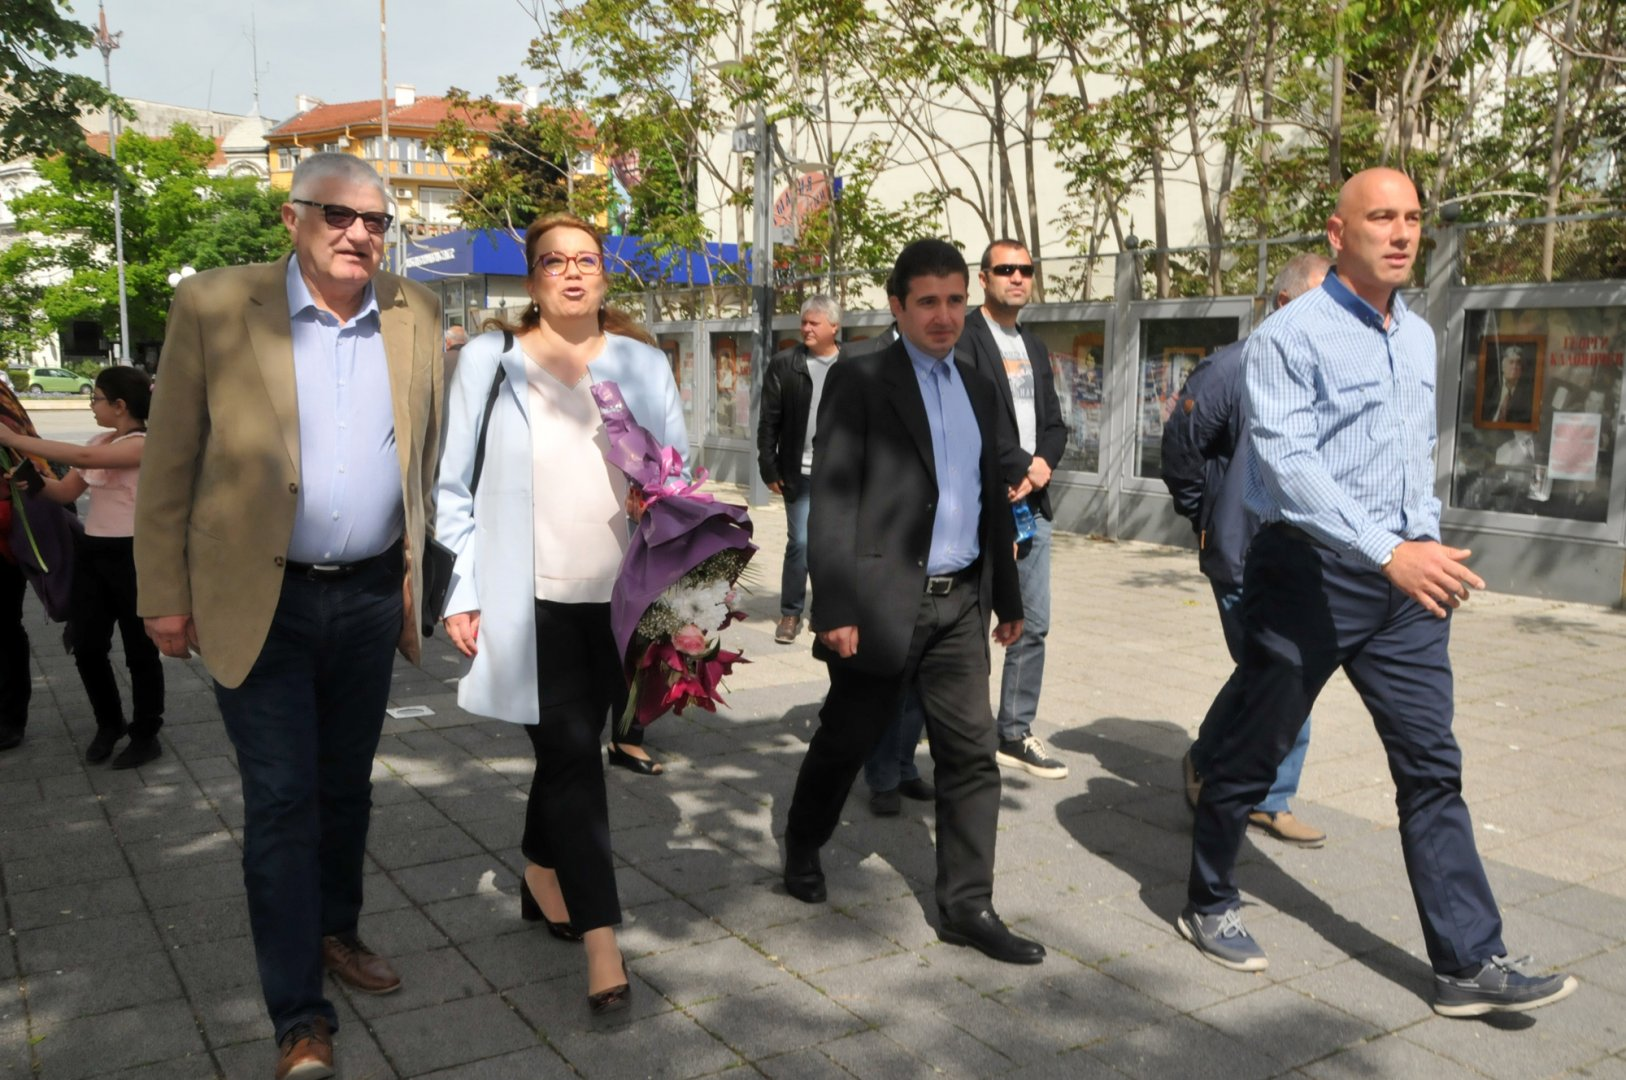 Деница Златева дойде заедно с депутатите Петър Кънев (вляво), Николай Тишев (вдясно) и Живко Господинов - общински лидер на БСП - Бургас. Снимки Лина Главинова